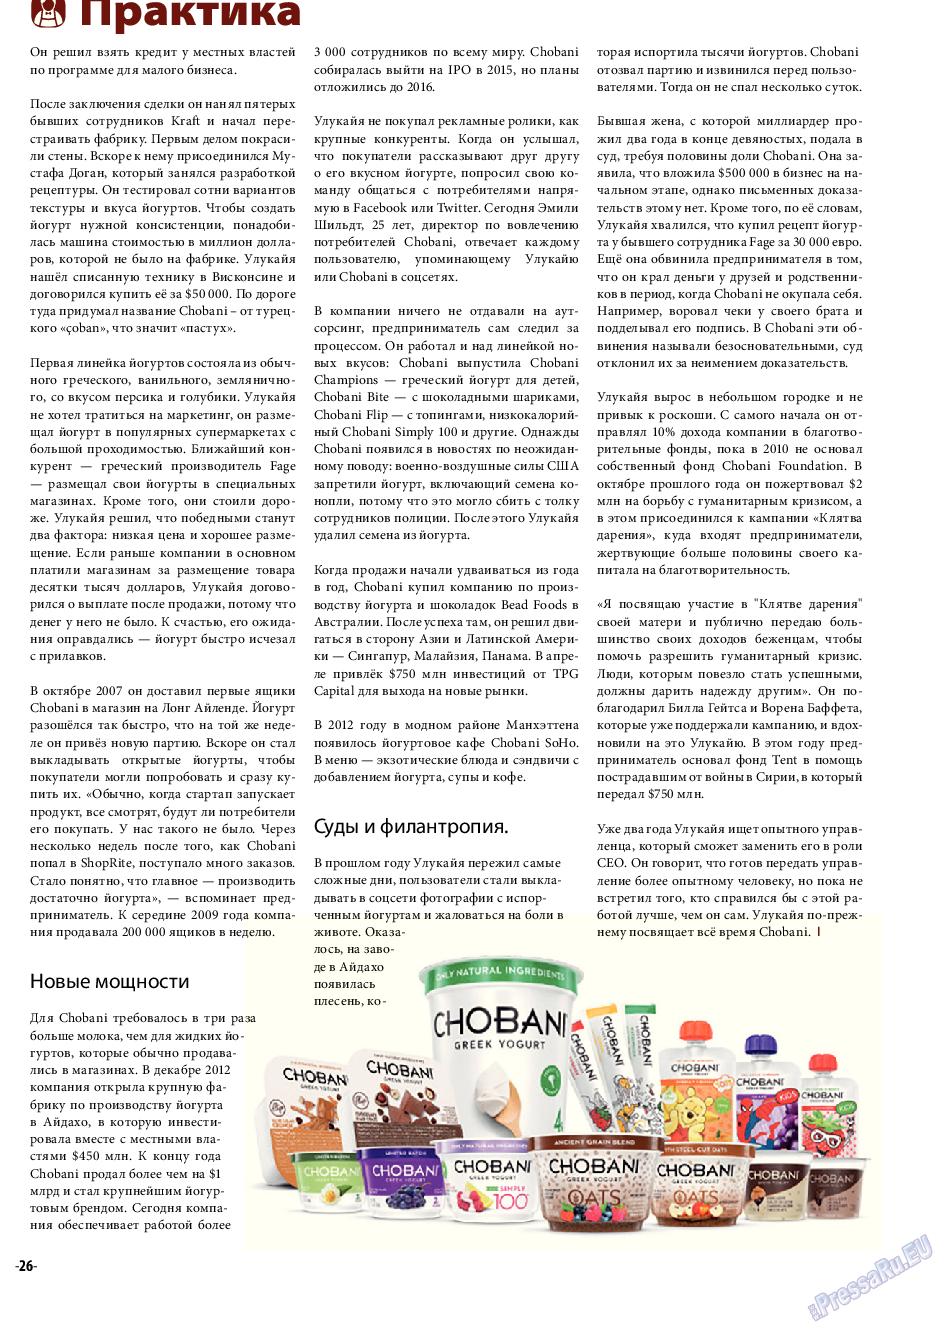 iDEAL (журнал). 2015 год, номер 12, стр. 26